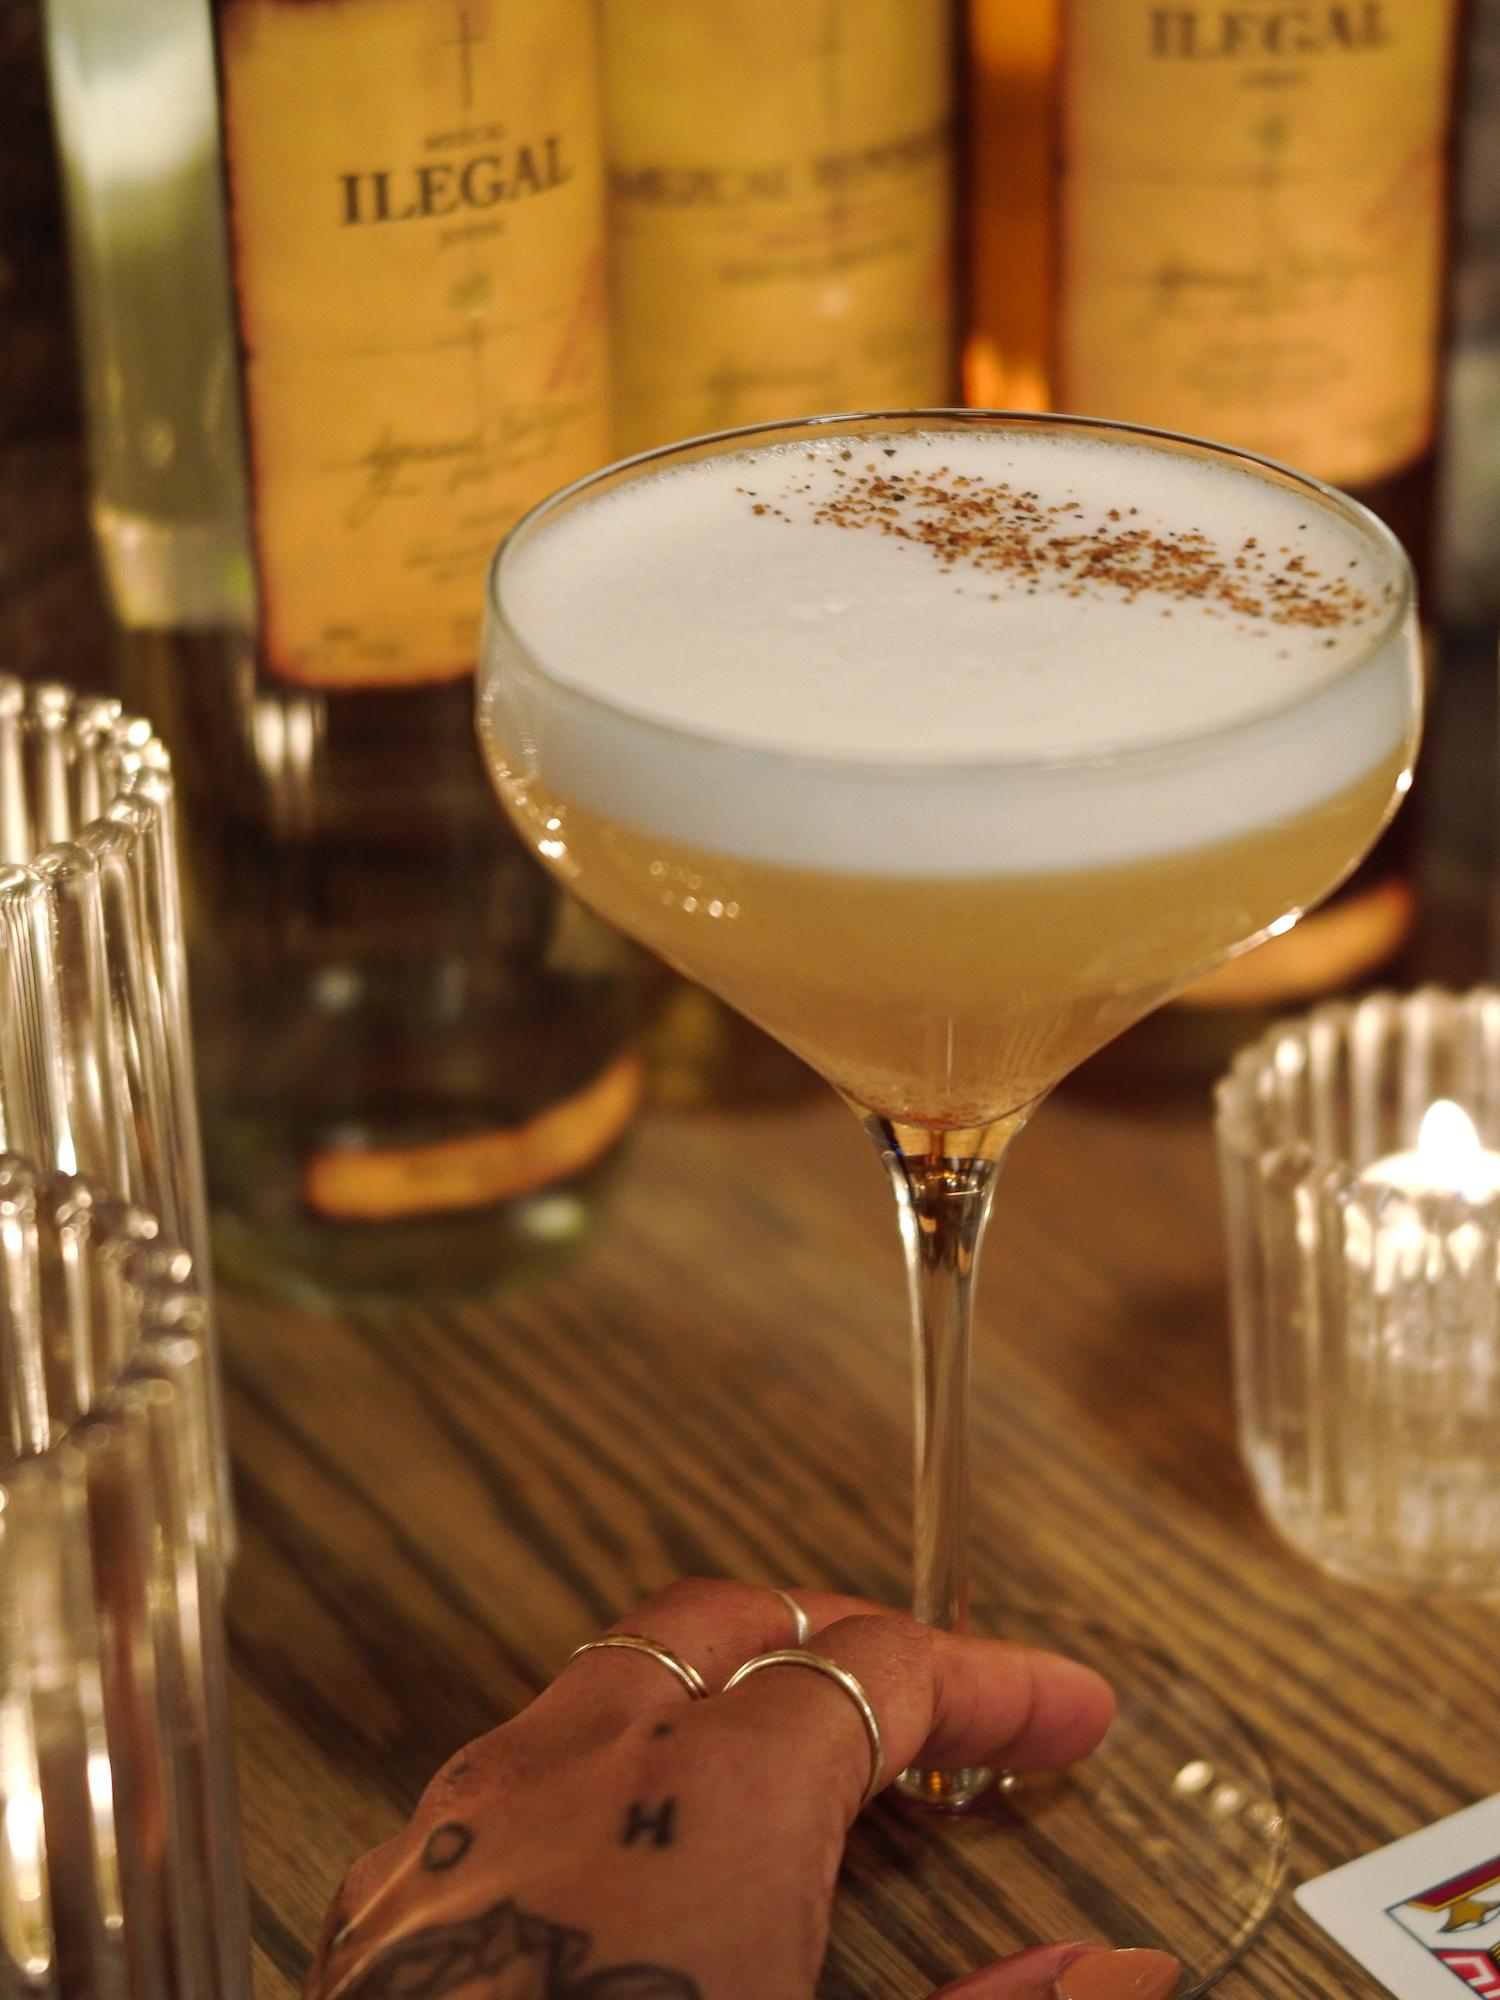 Ilegal Mezcal Cocktails - Pina de Otono